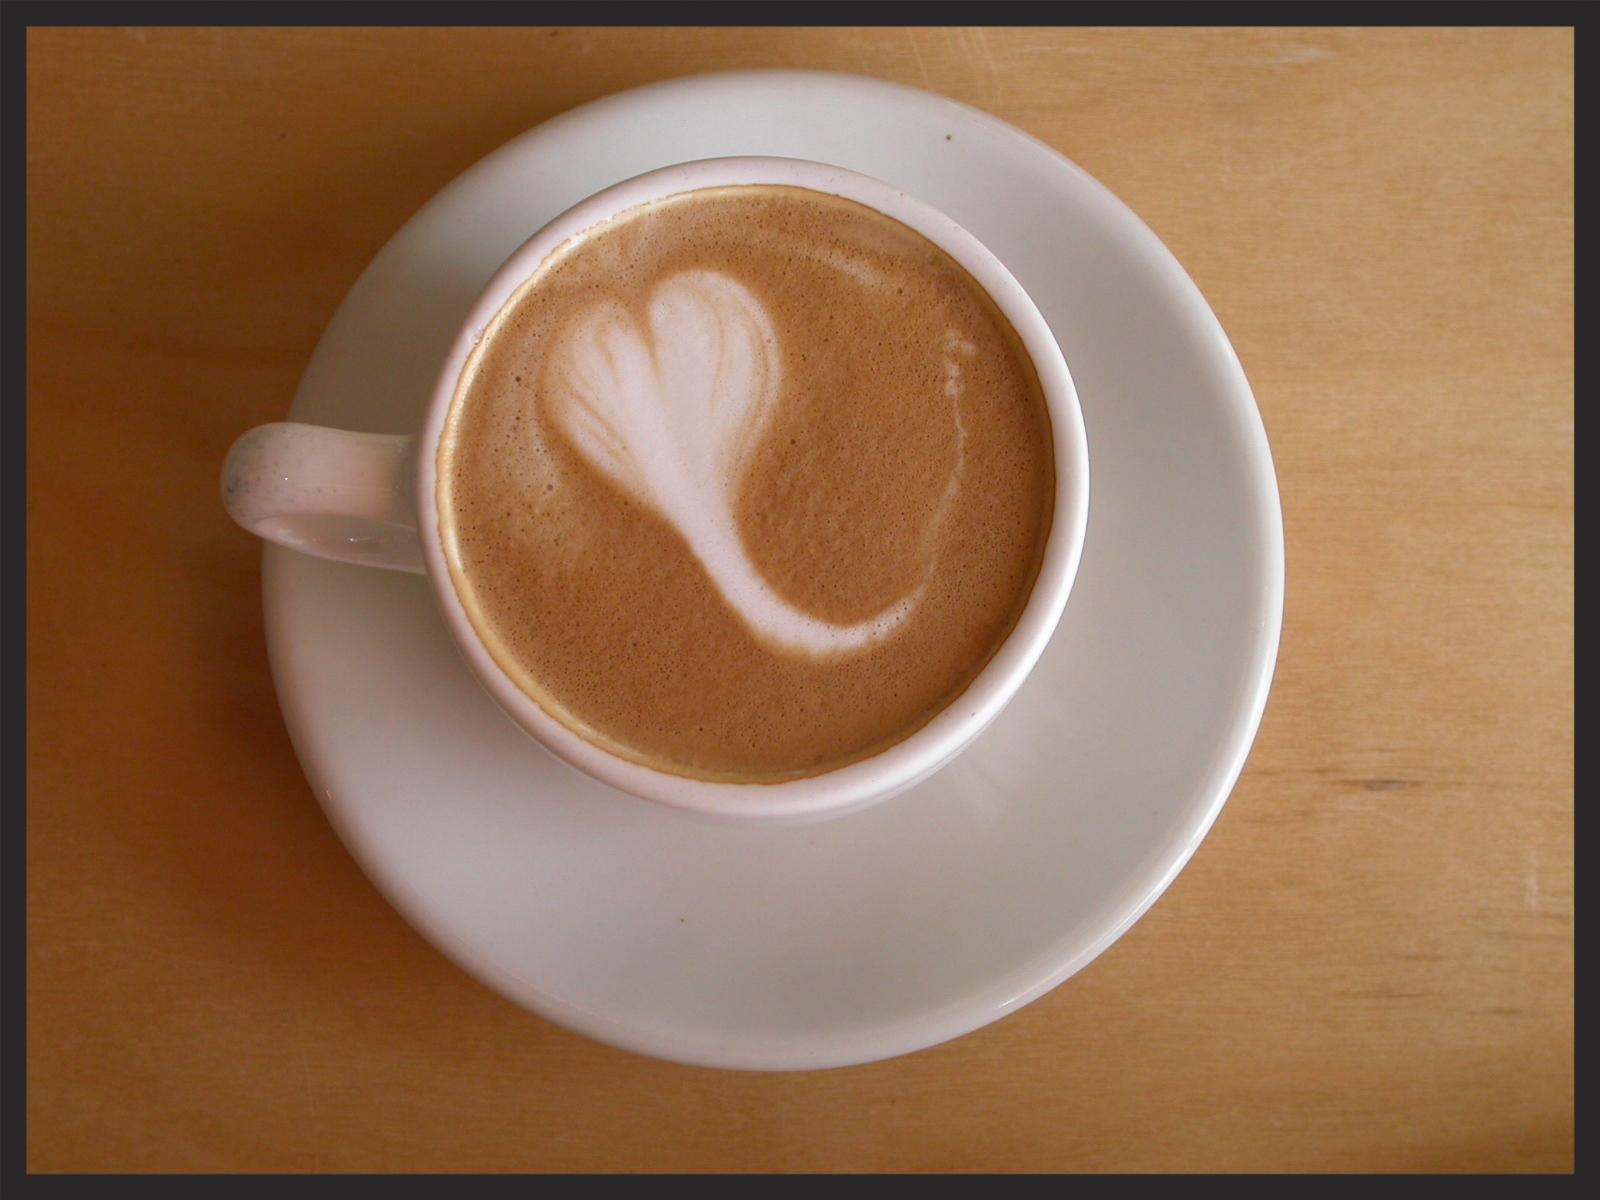 coffee-1559191 - Copy.jpg